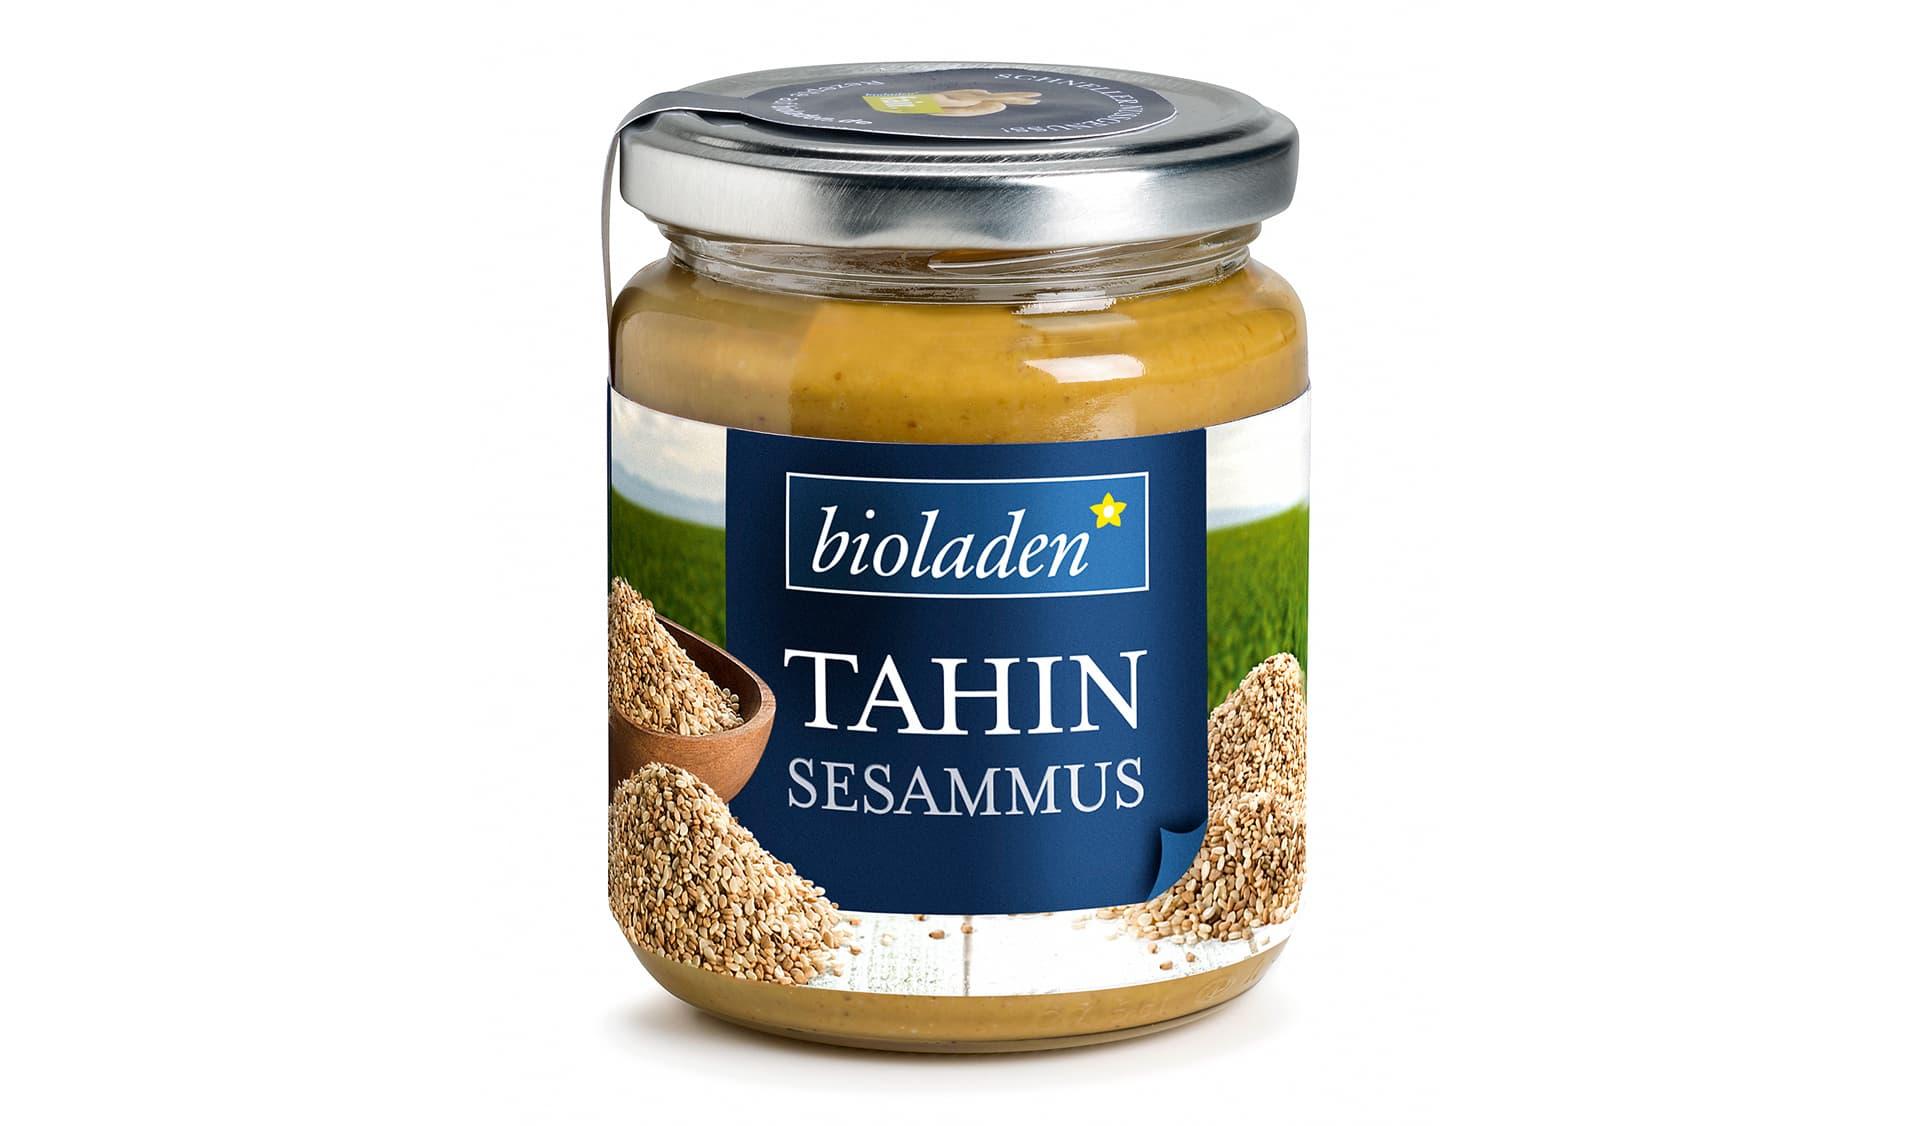 Bioladen Tahin, Sesammus (www.bioladen.de)